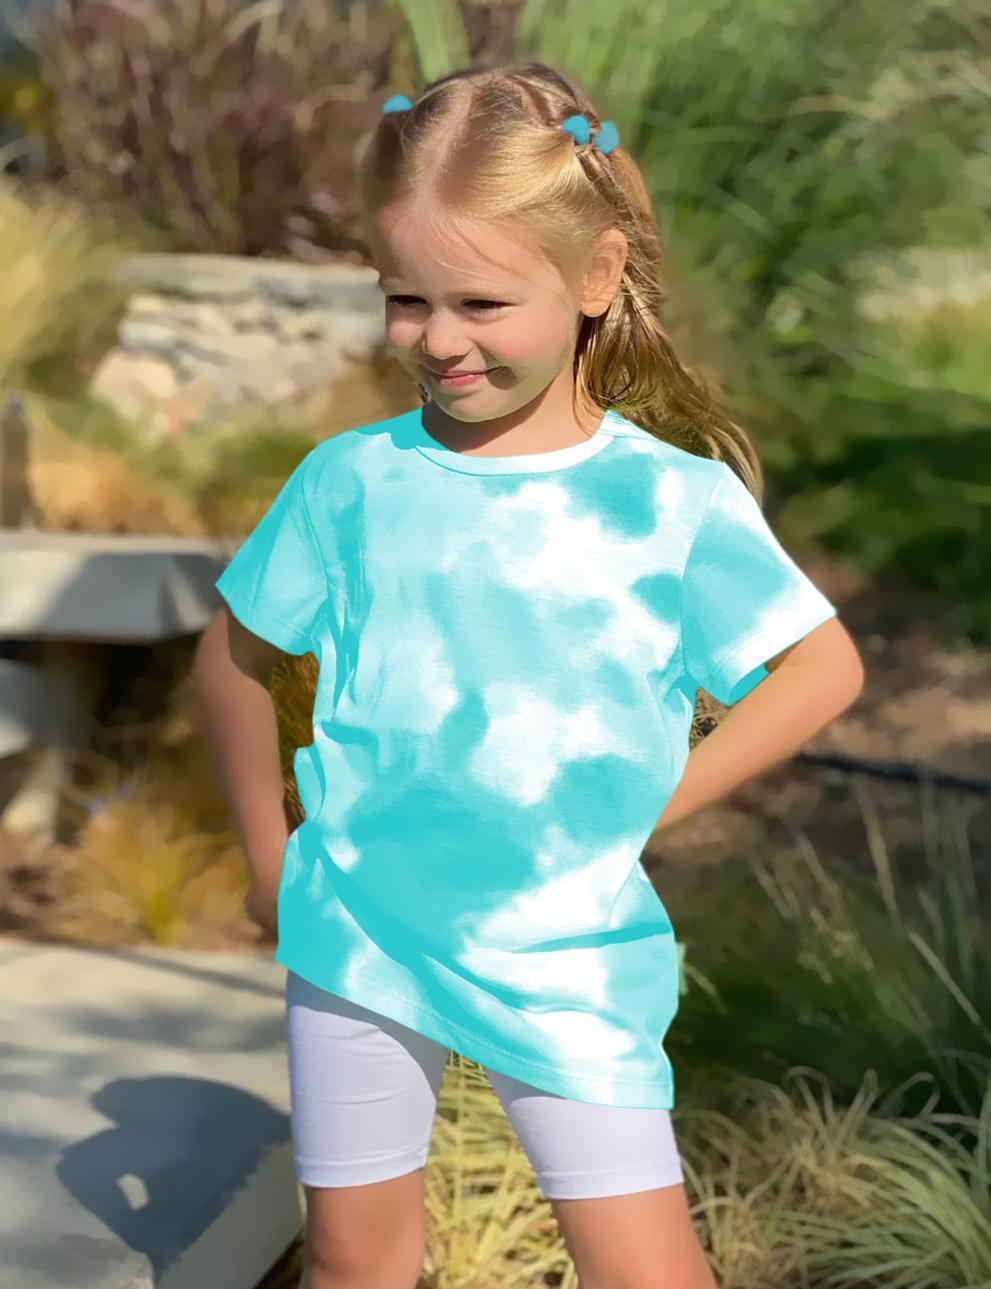 Детская футболка КЕТМИН цв.Тай Дай Бирюза